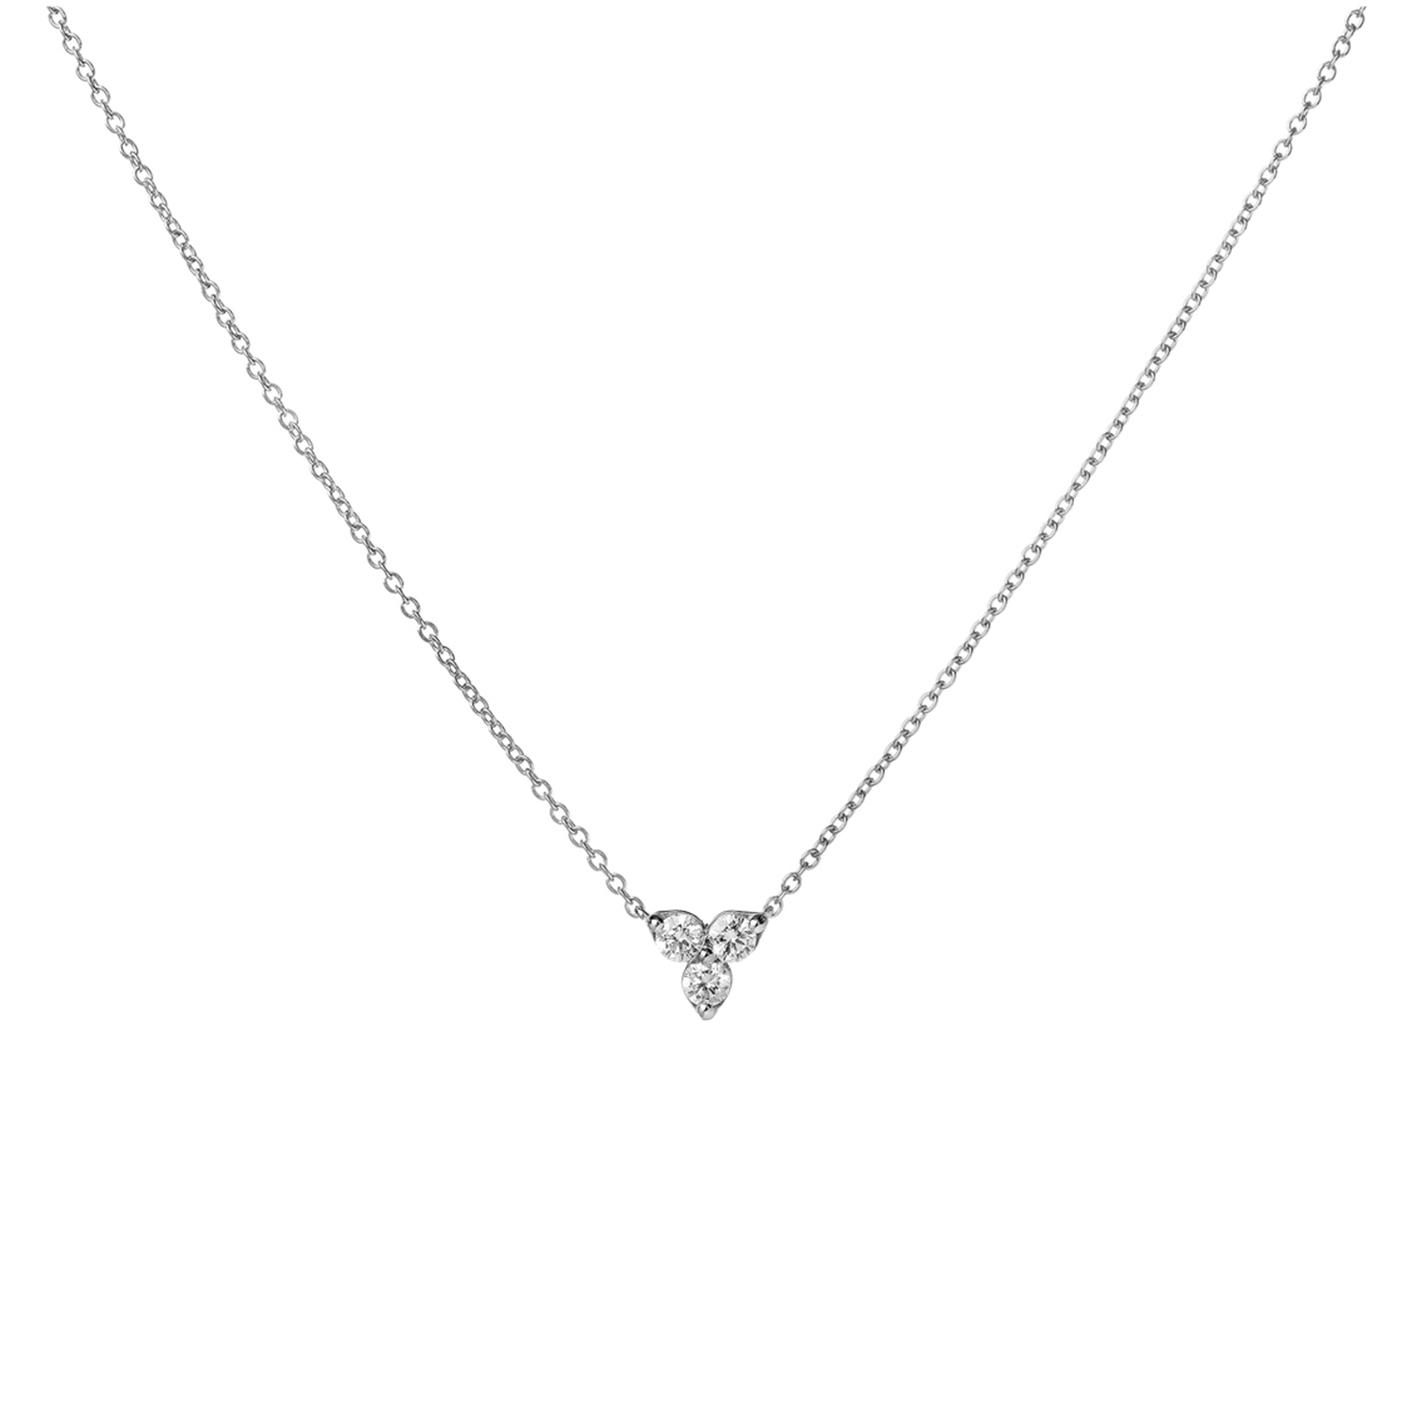 Sensi joyas jewellery Granada silver engagementDIAMONDS PENDANT